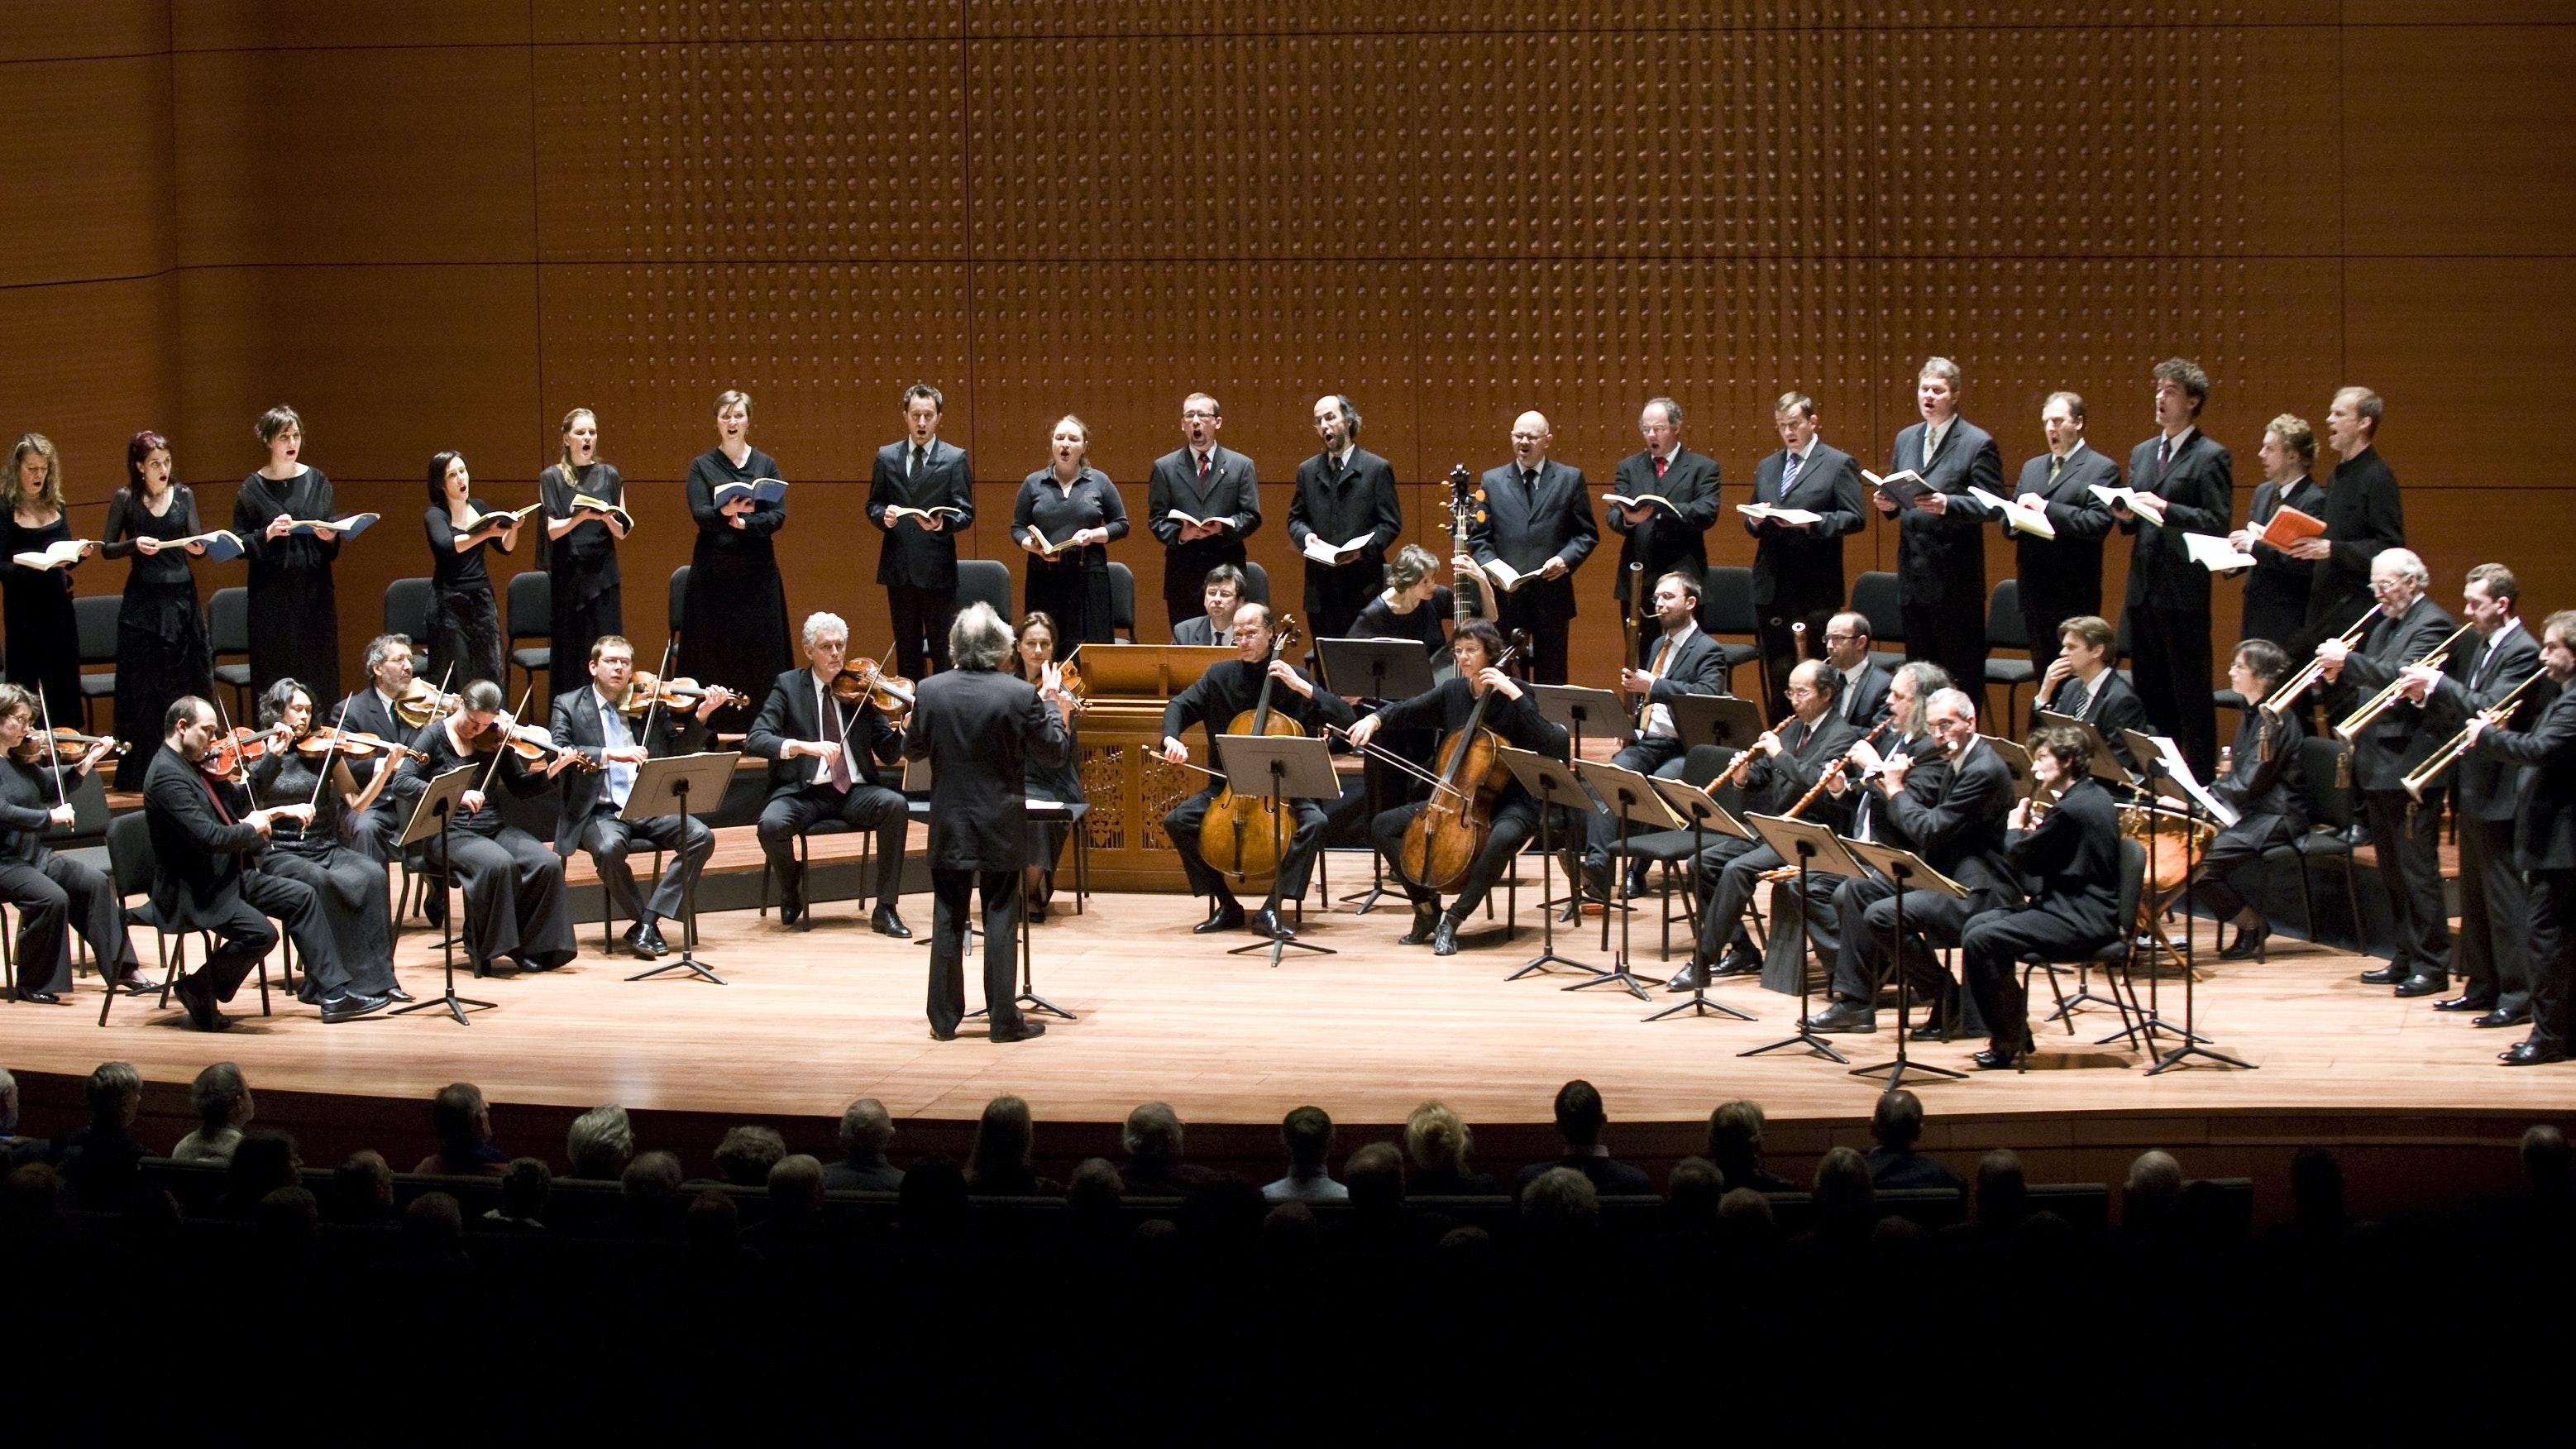 Philippe Herreweghe dirige L'Oratorio de Noël de Bach, BWV 248